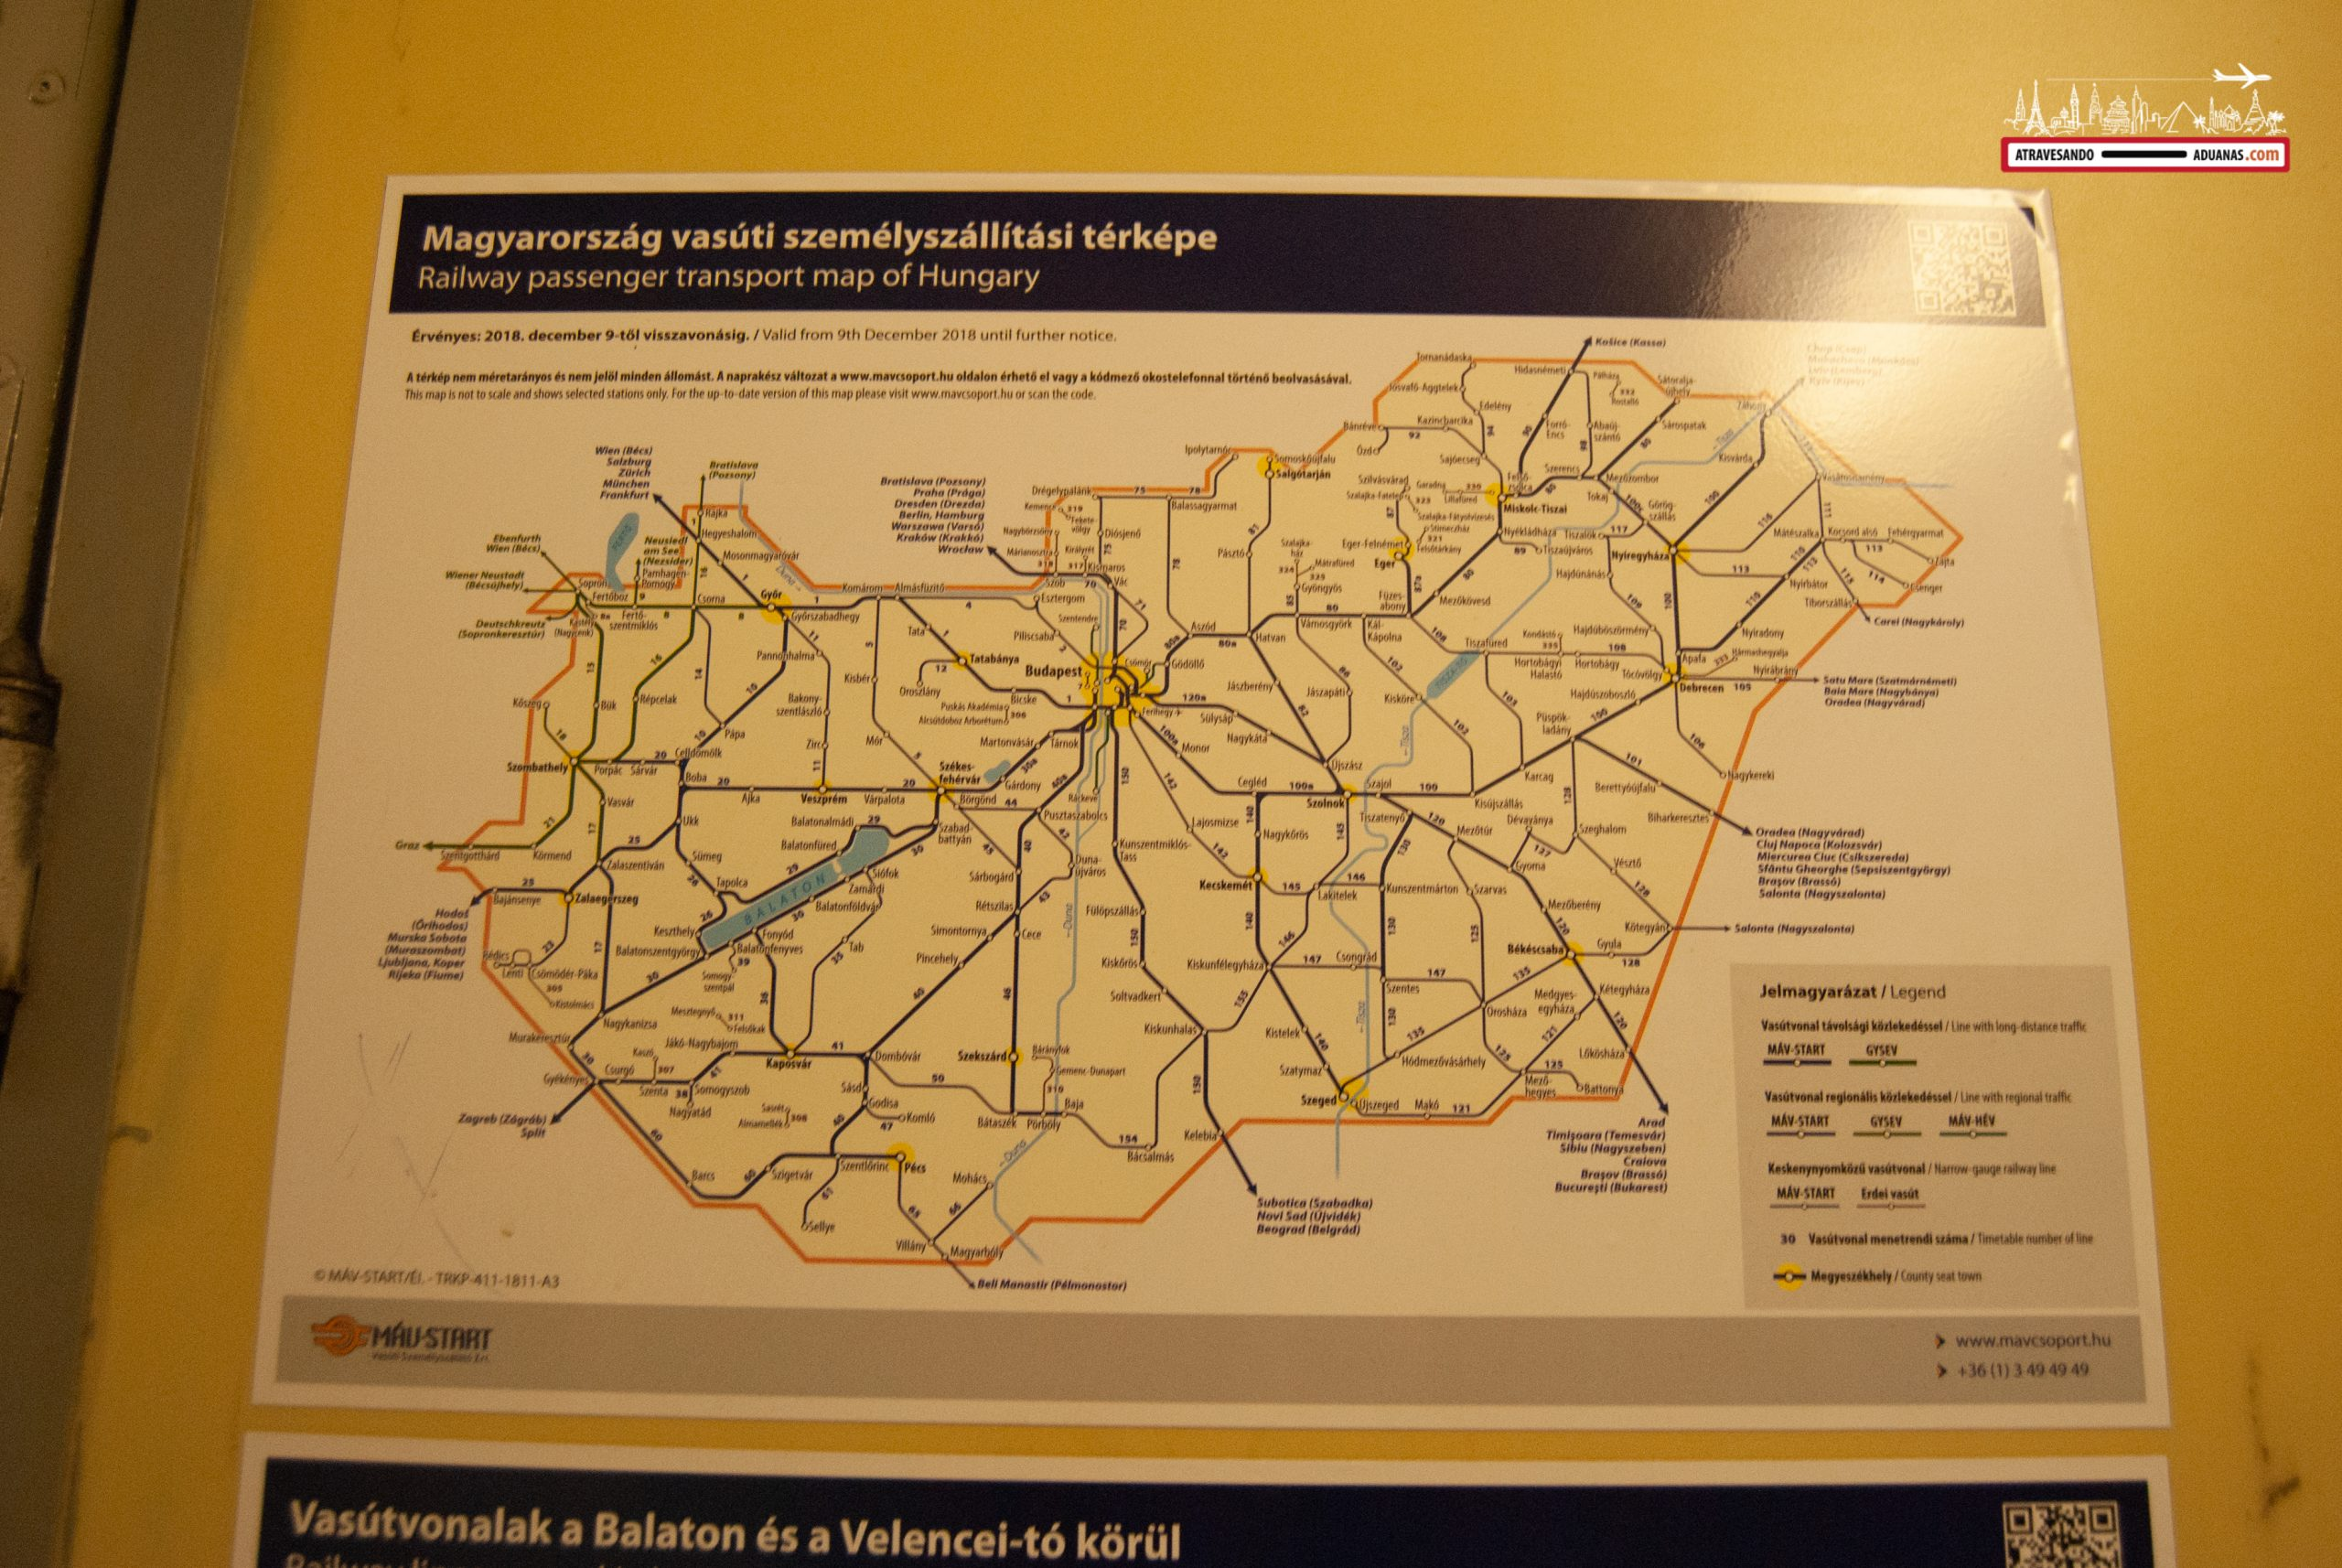 Mapa de la red de ferrocarriles húngaros